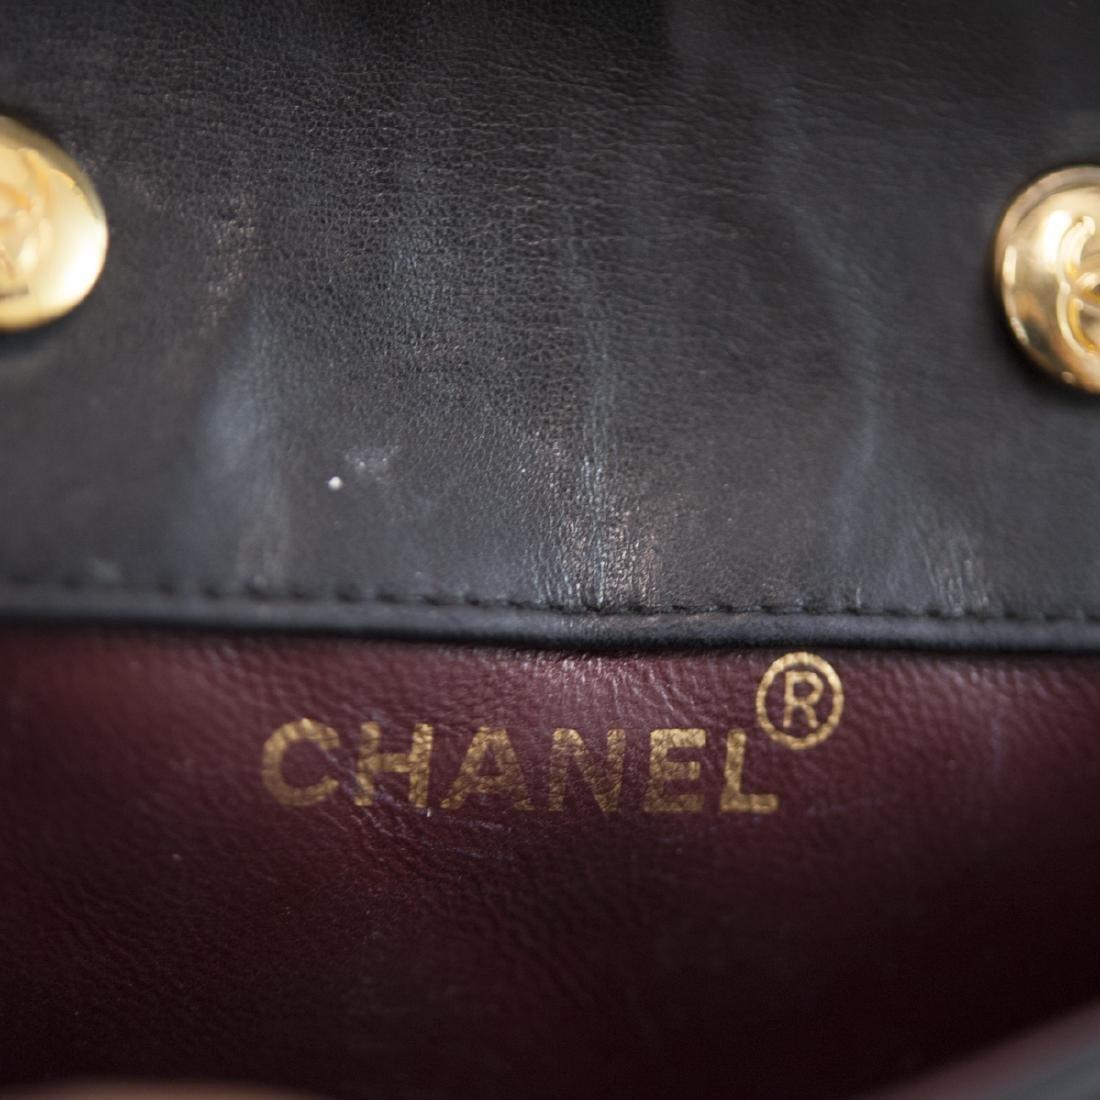 Chanel Mini Black Leather Flap Bag - 2